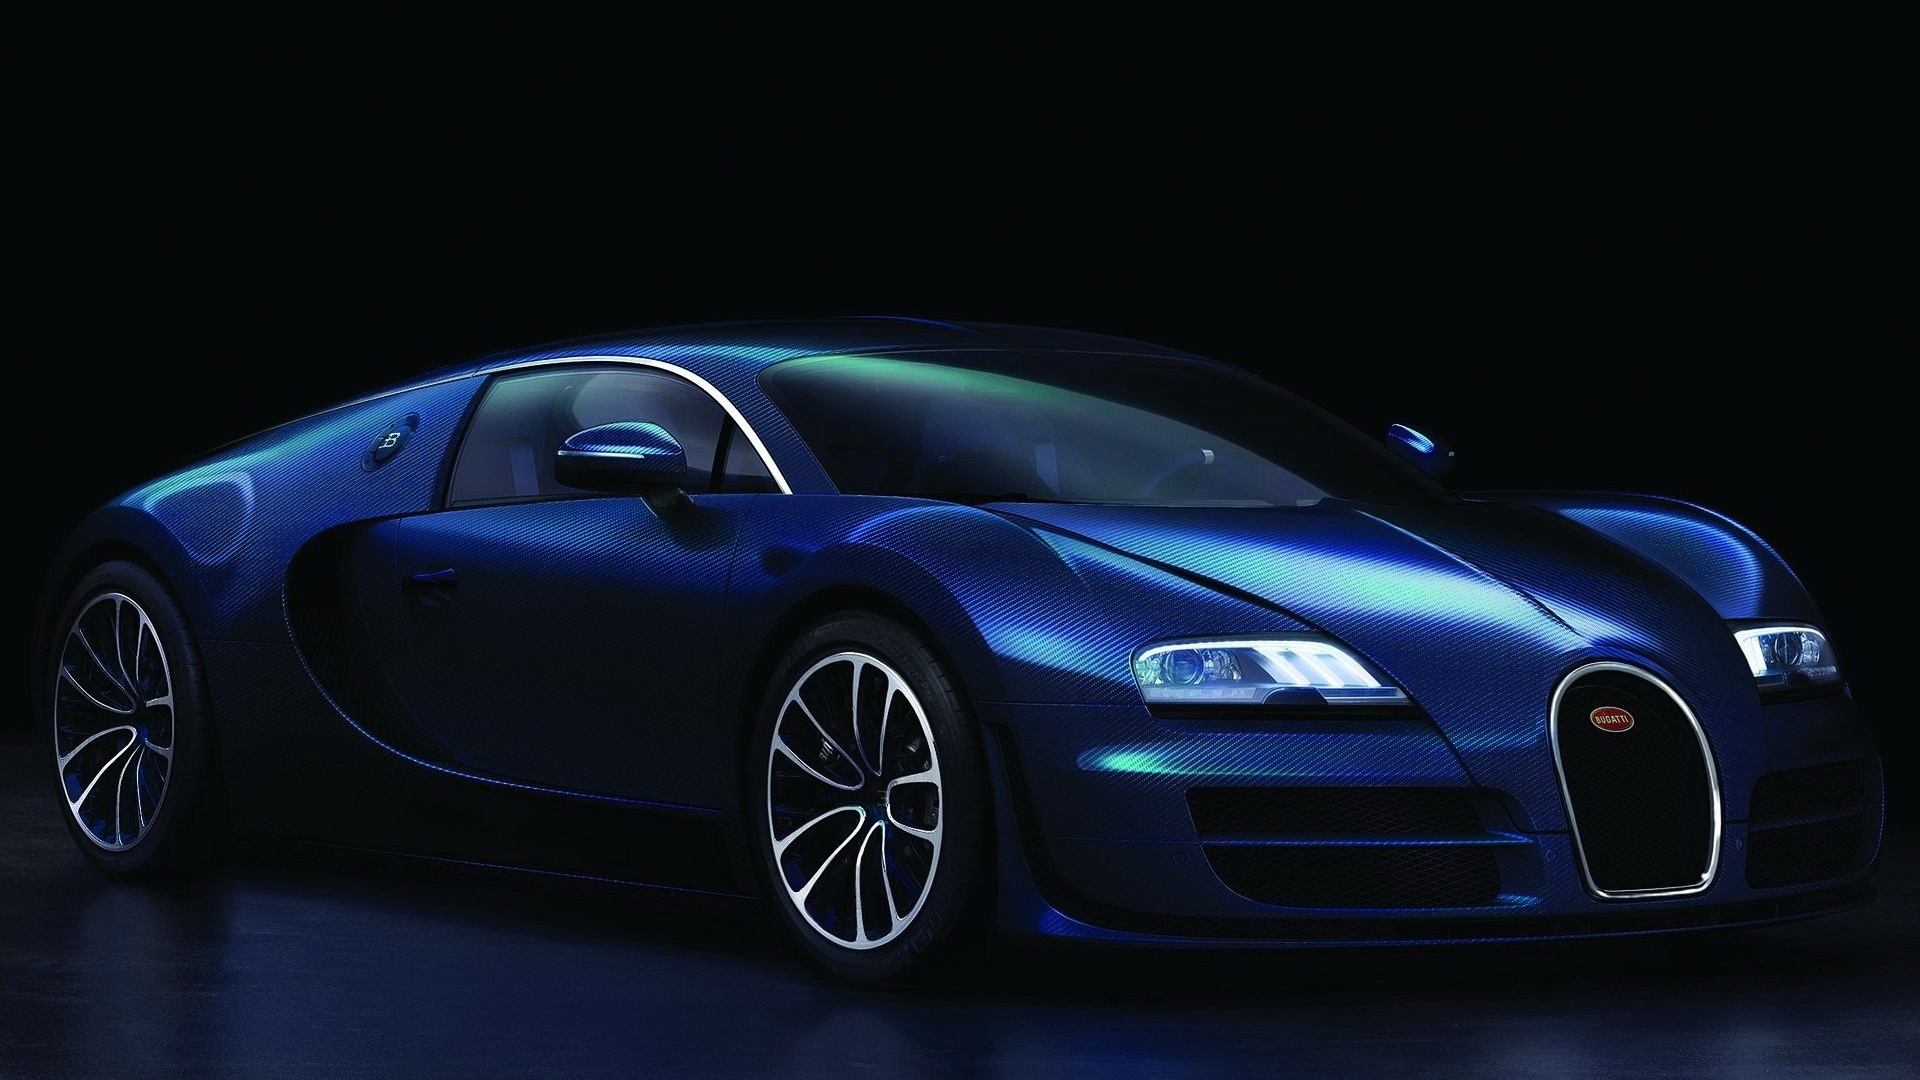 Bugatti Veyron Wallpaper Super Sport car desktop Wallpapers 1920x1080